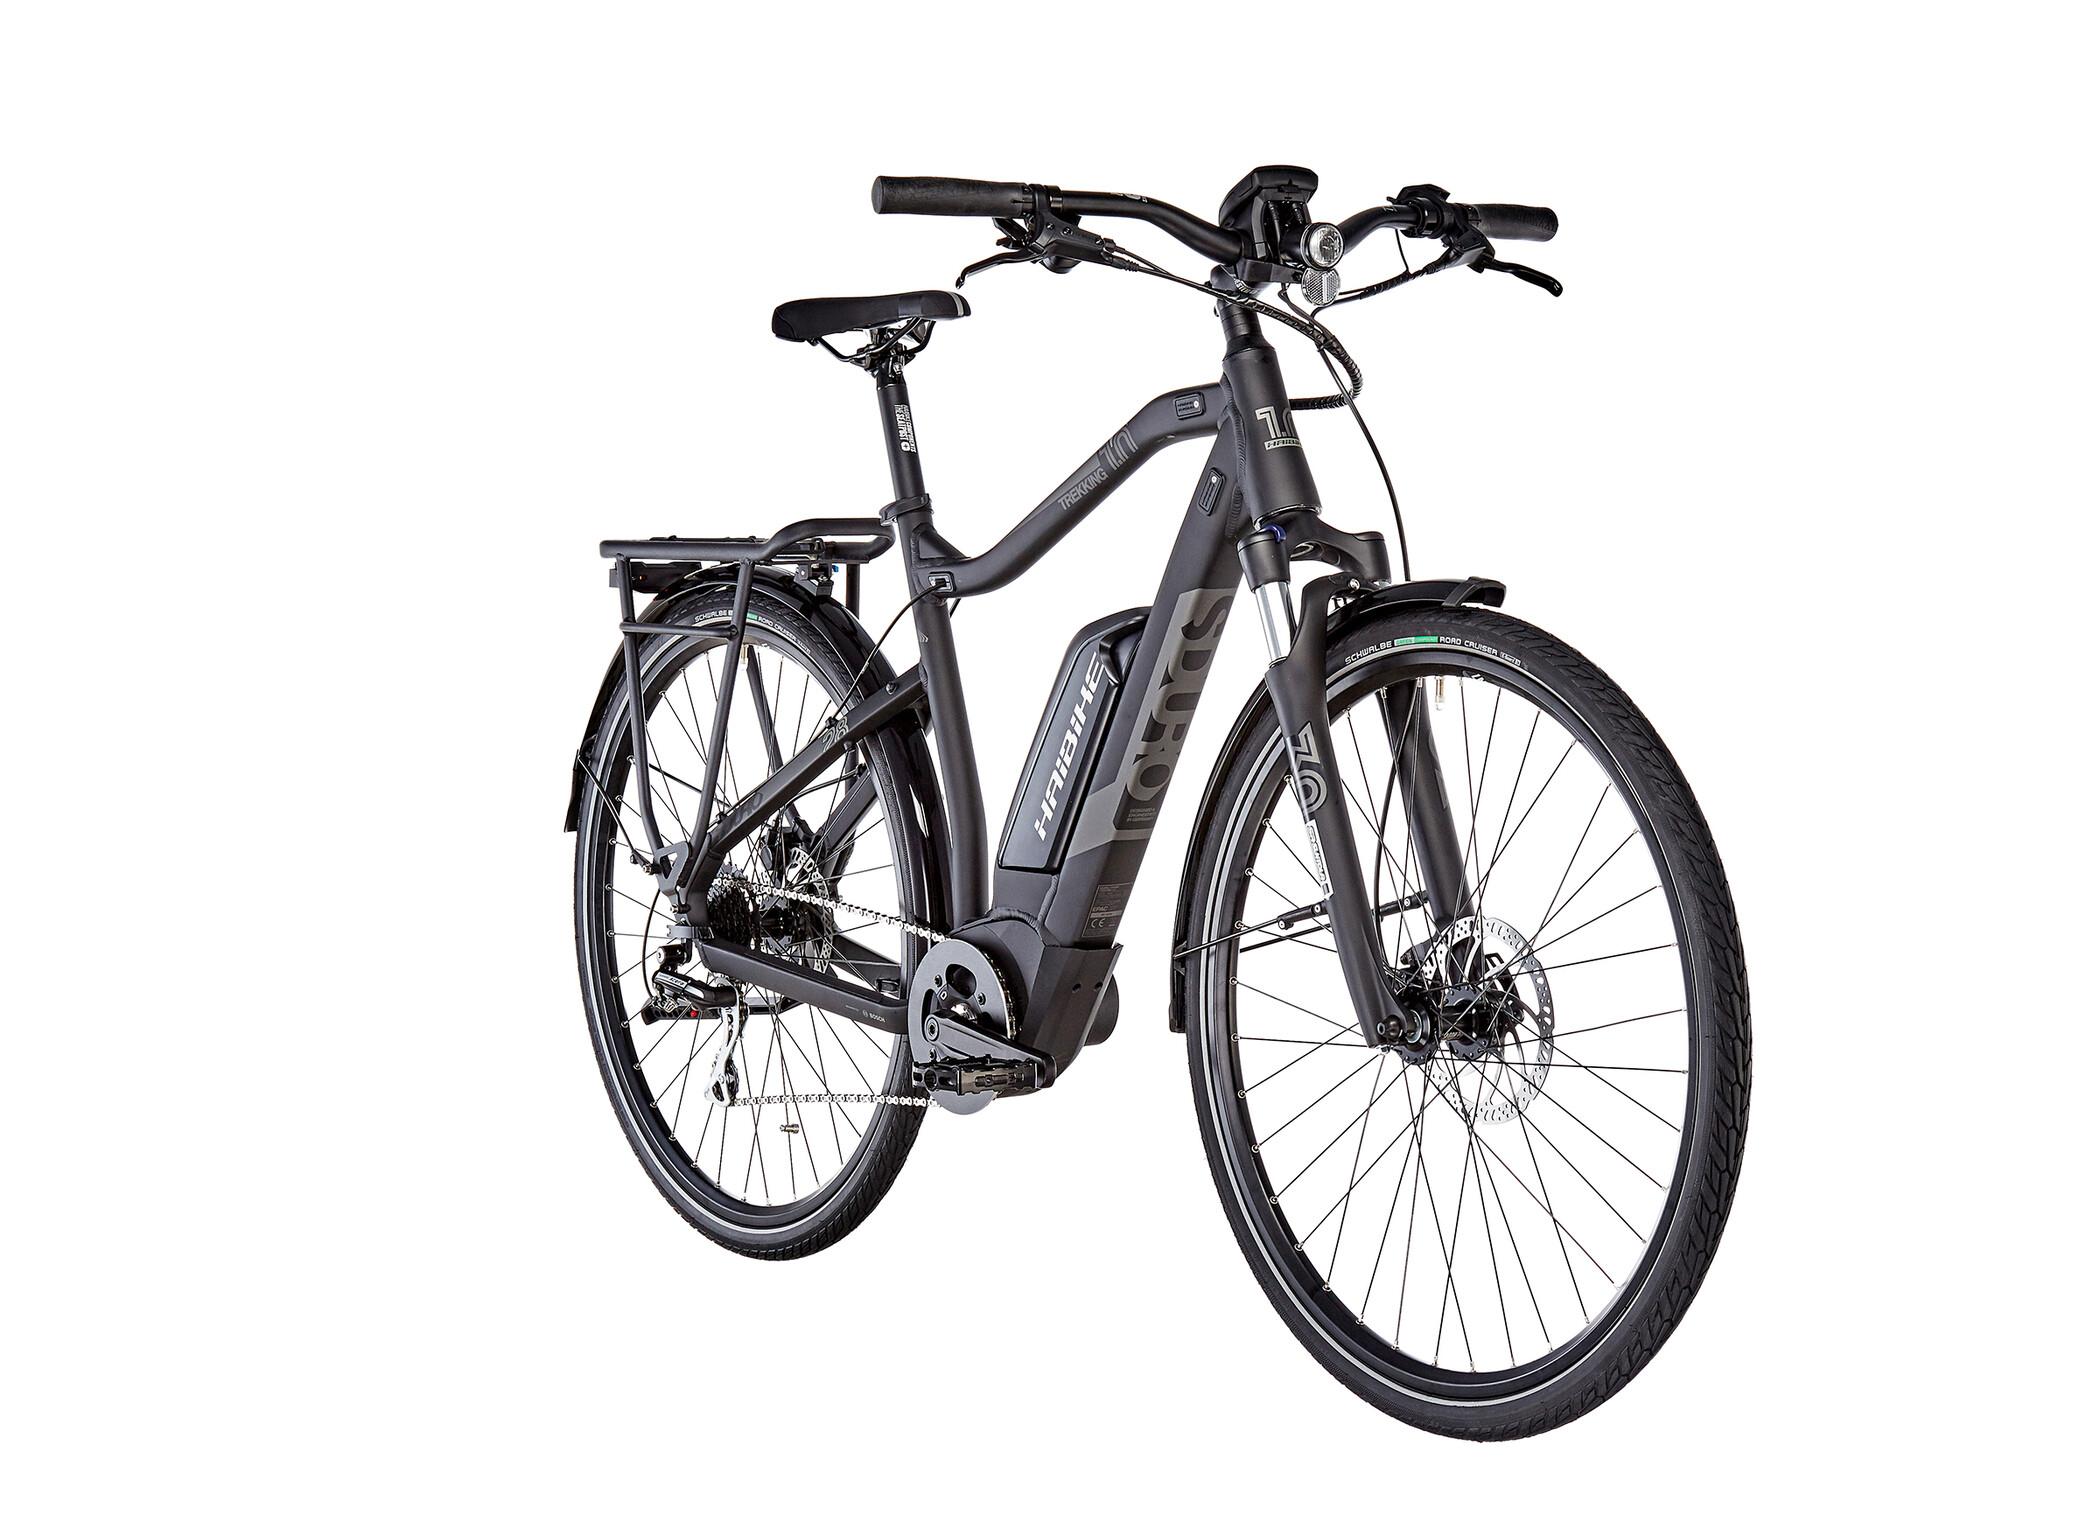 "(Fahrrad.de) Haibike SDURO Trekking 1.0 (2019) E-Bike 64cm/28"""